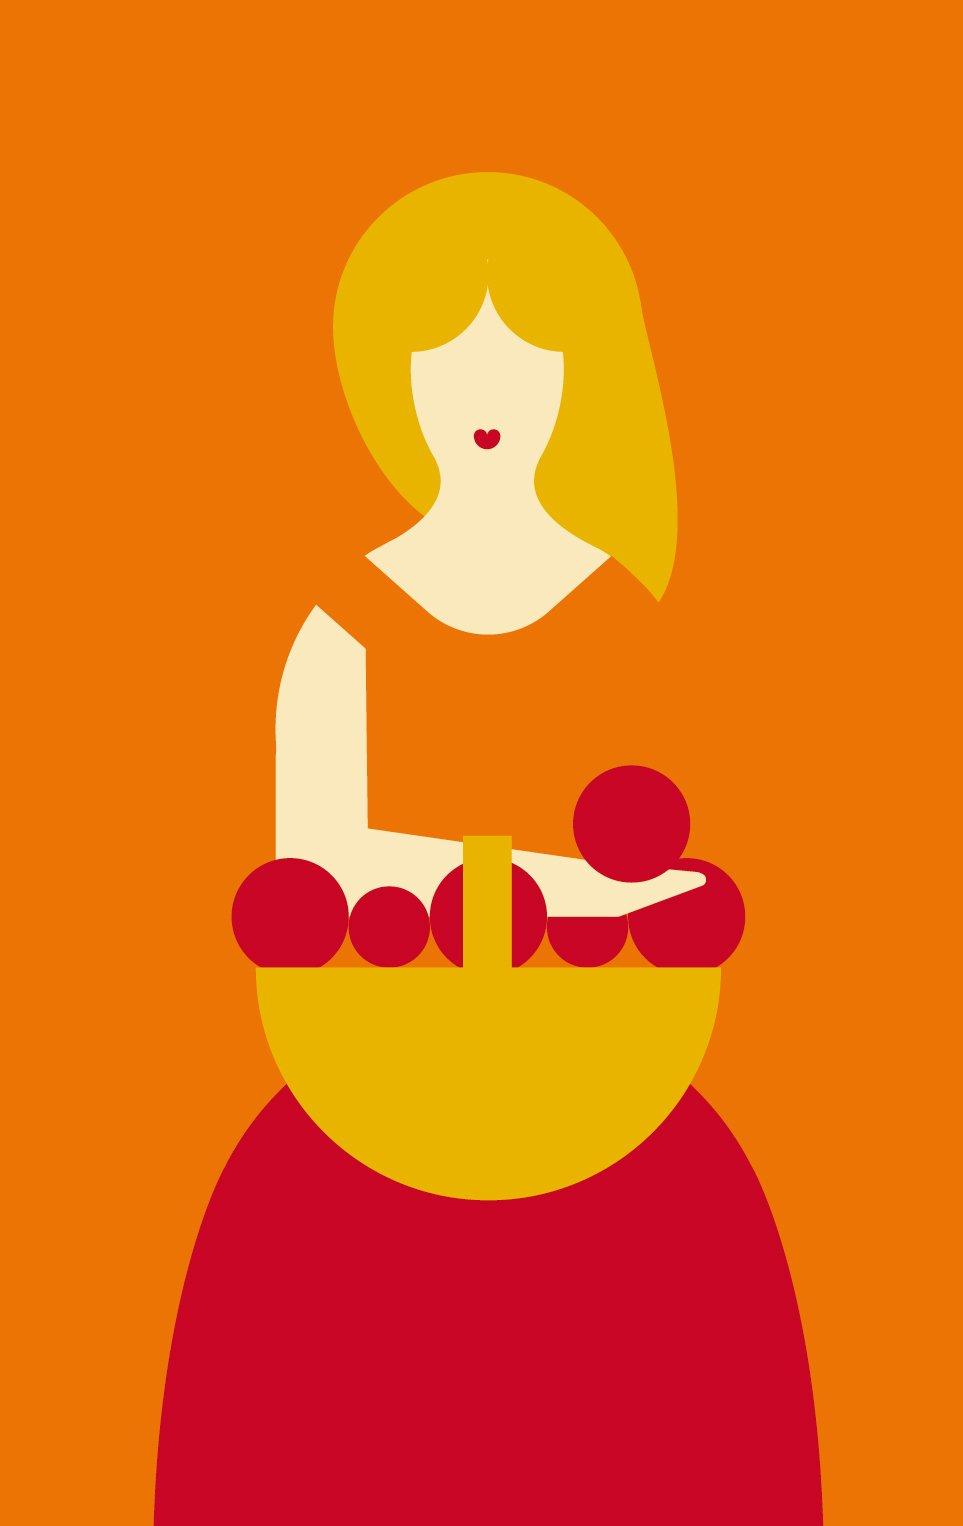 girls-illustration-coverb-alice-iuri